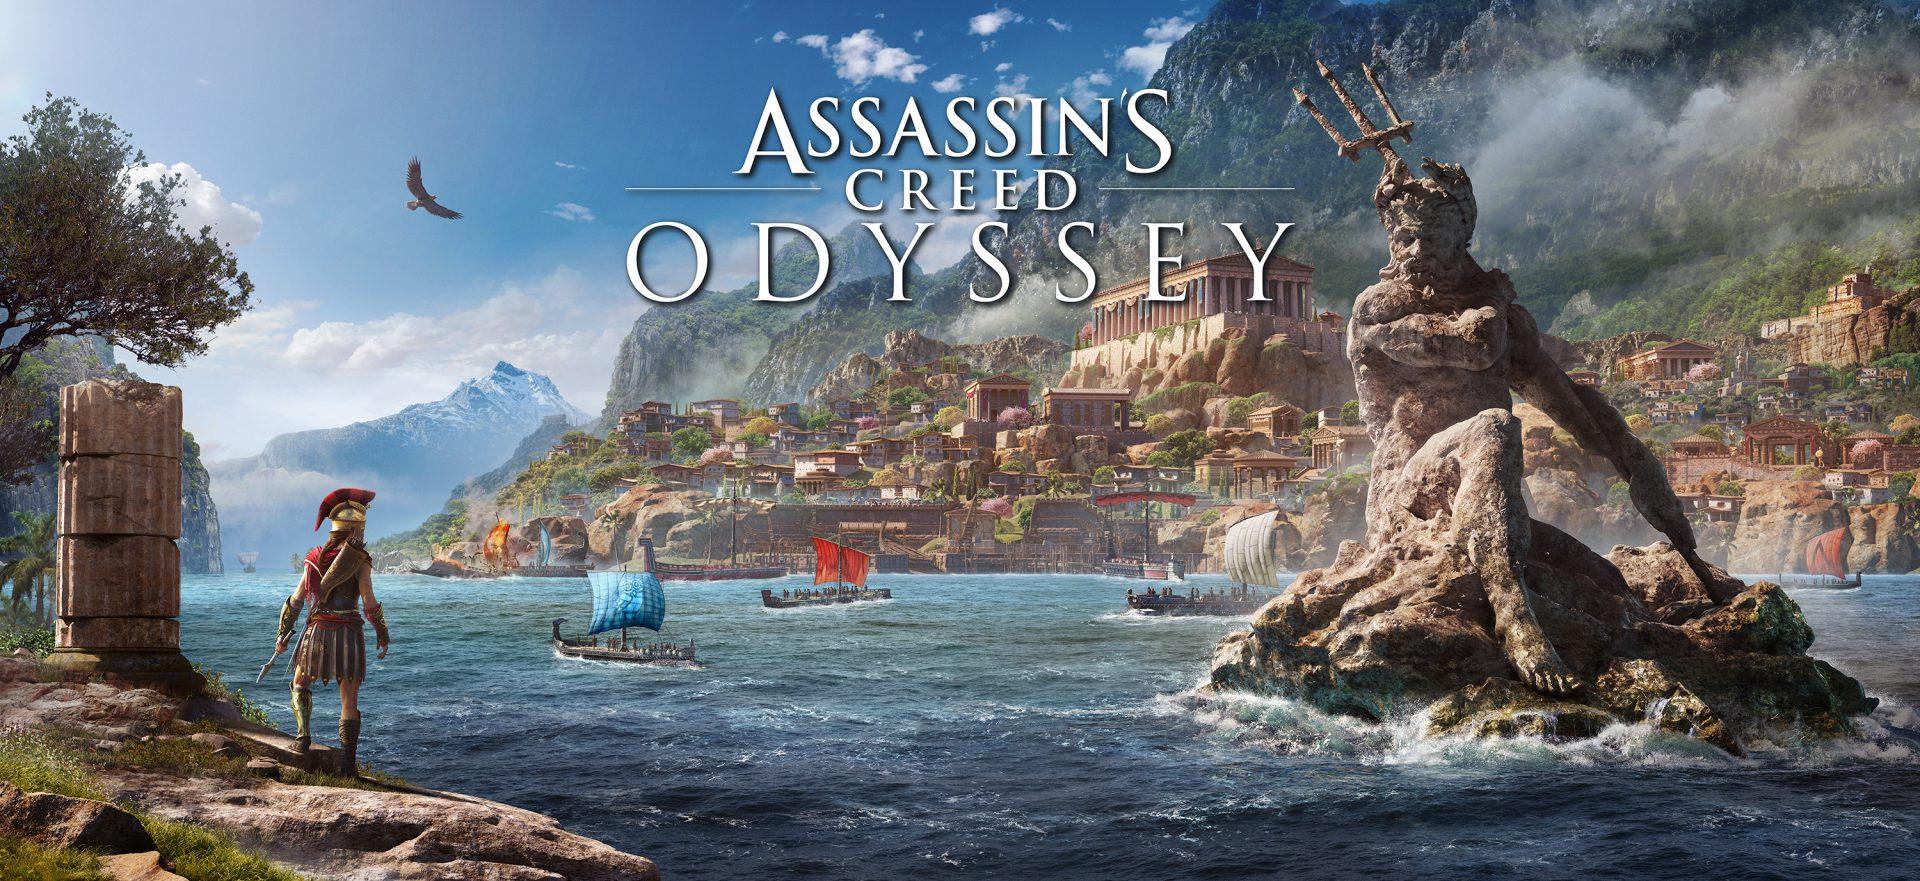 Assassins Creed Odyssey Key Kauf zum Best-Preis